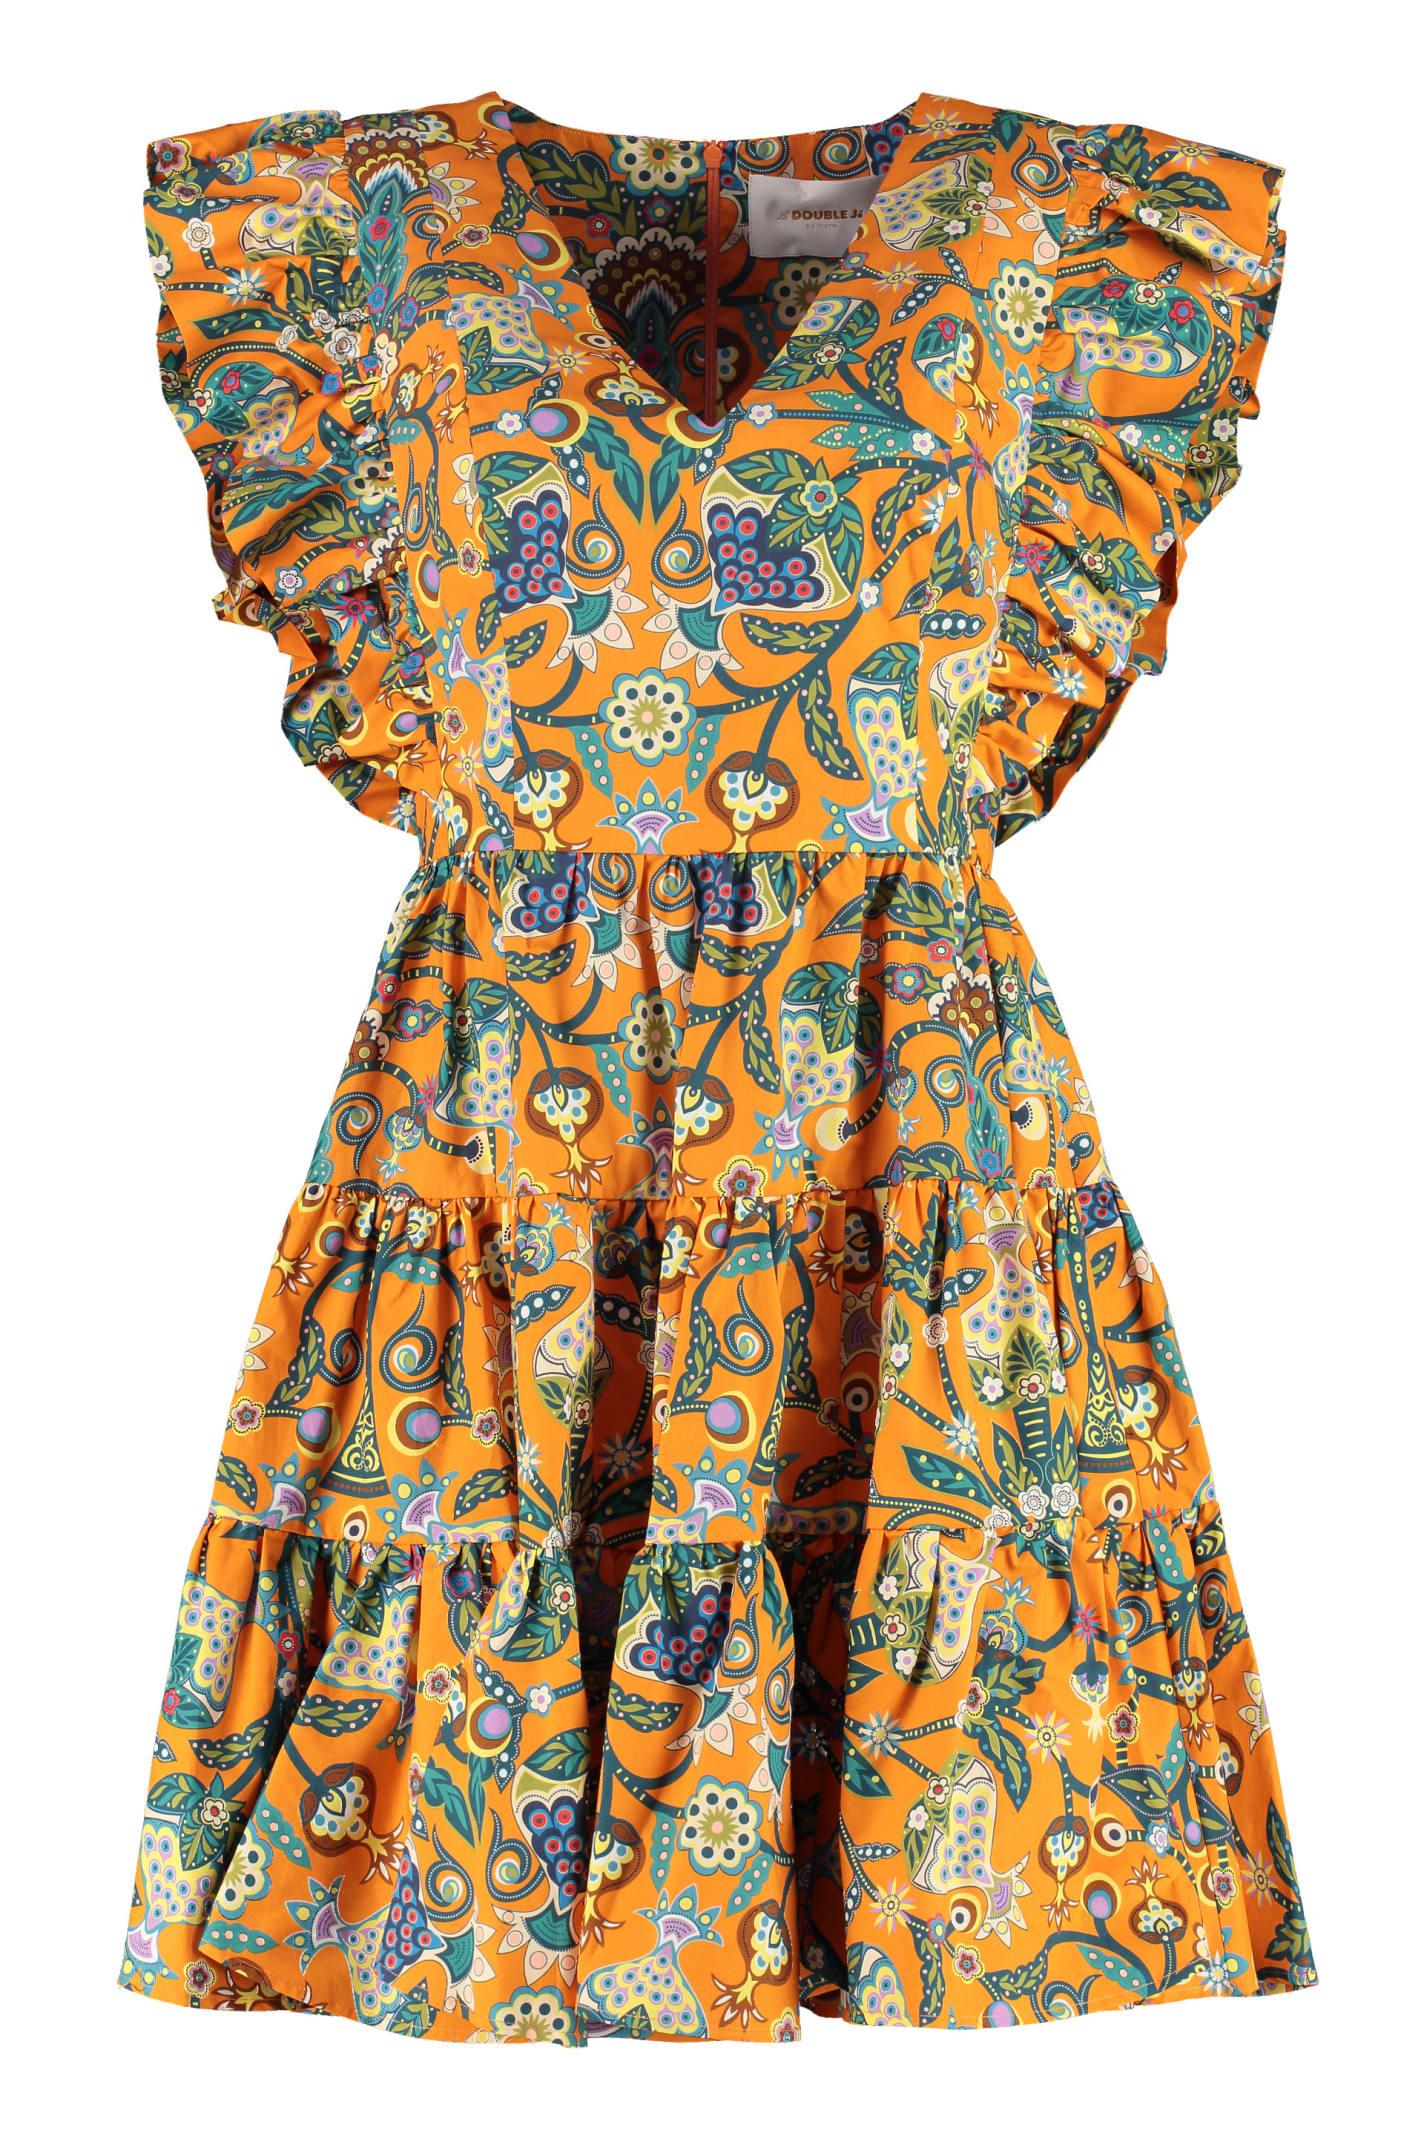 La Doublej Cottons HONEYBUN RUFFLED HEM DRESS